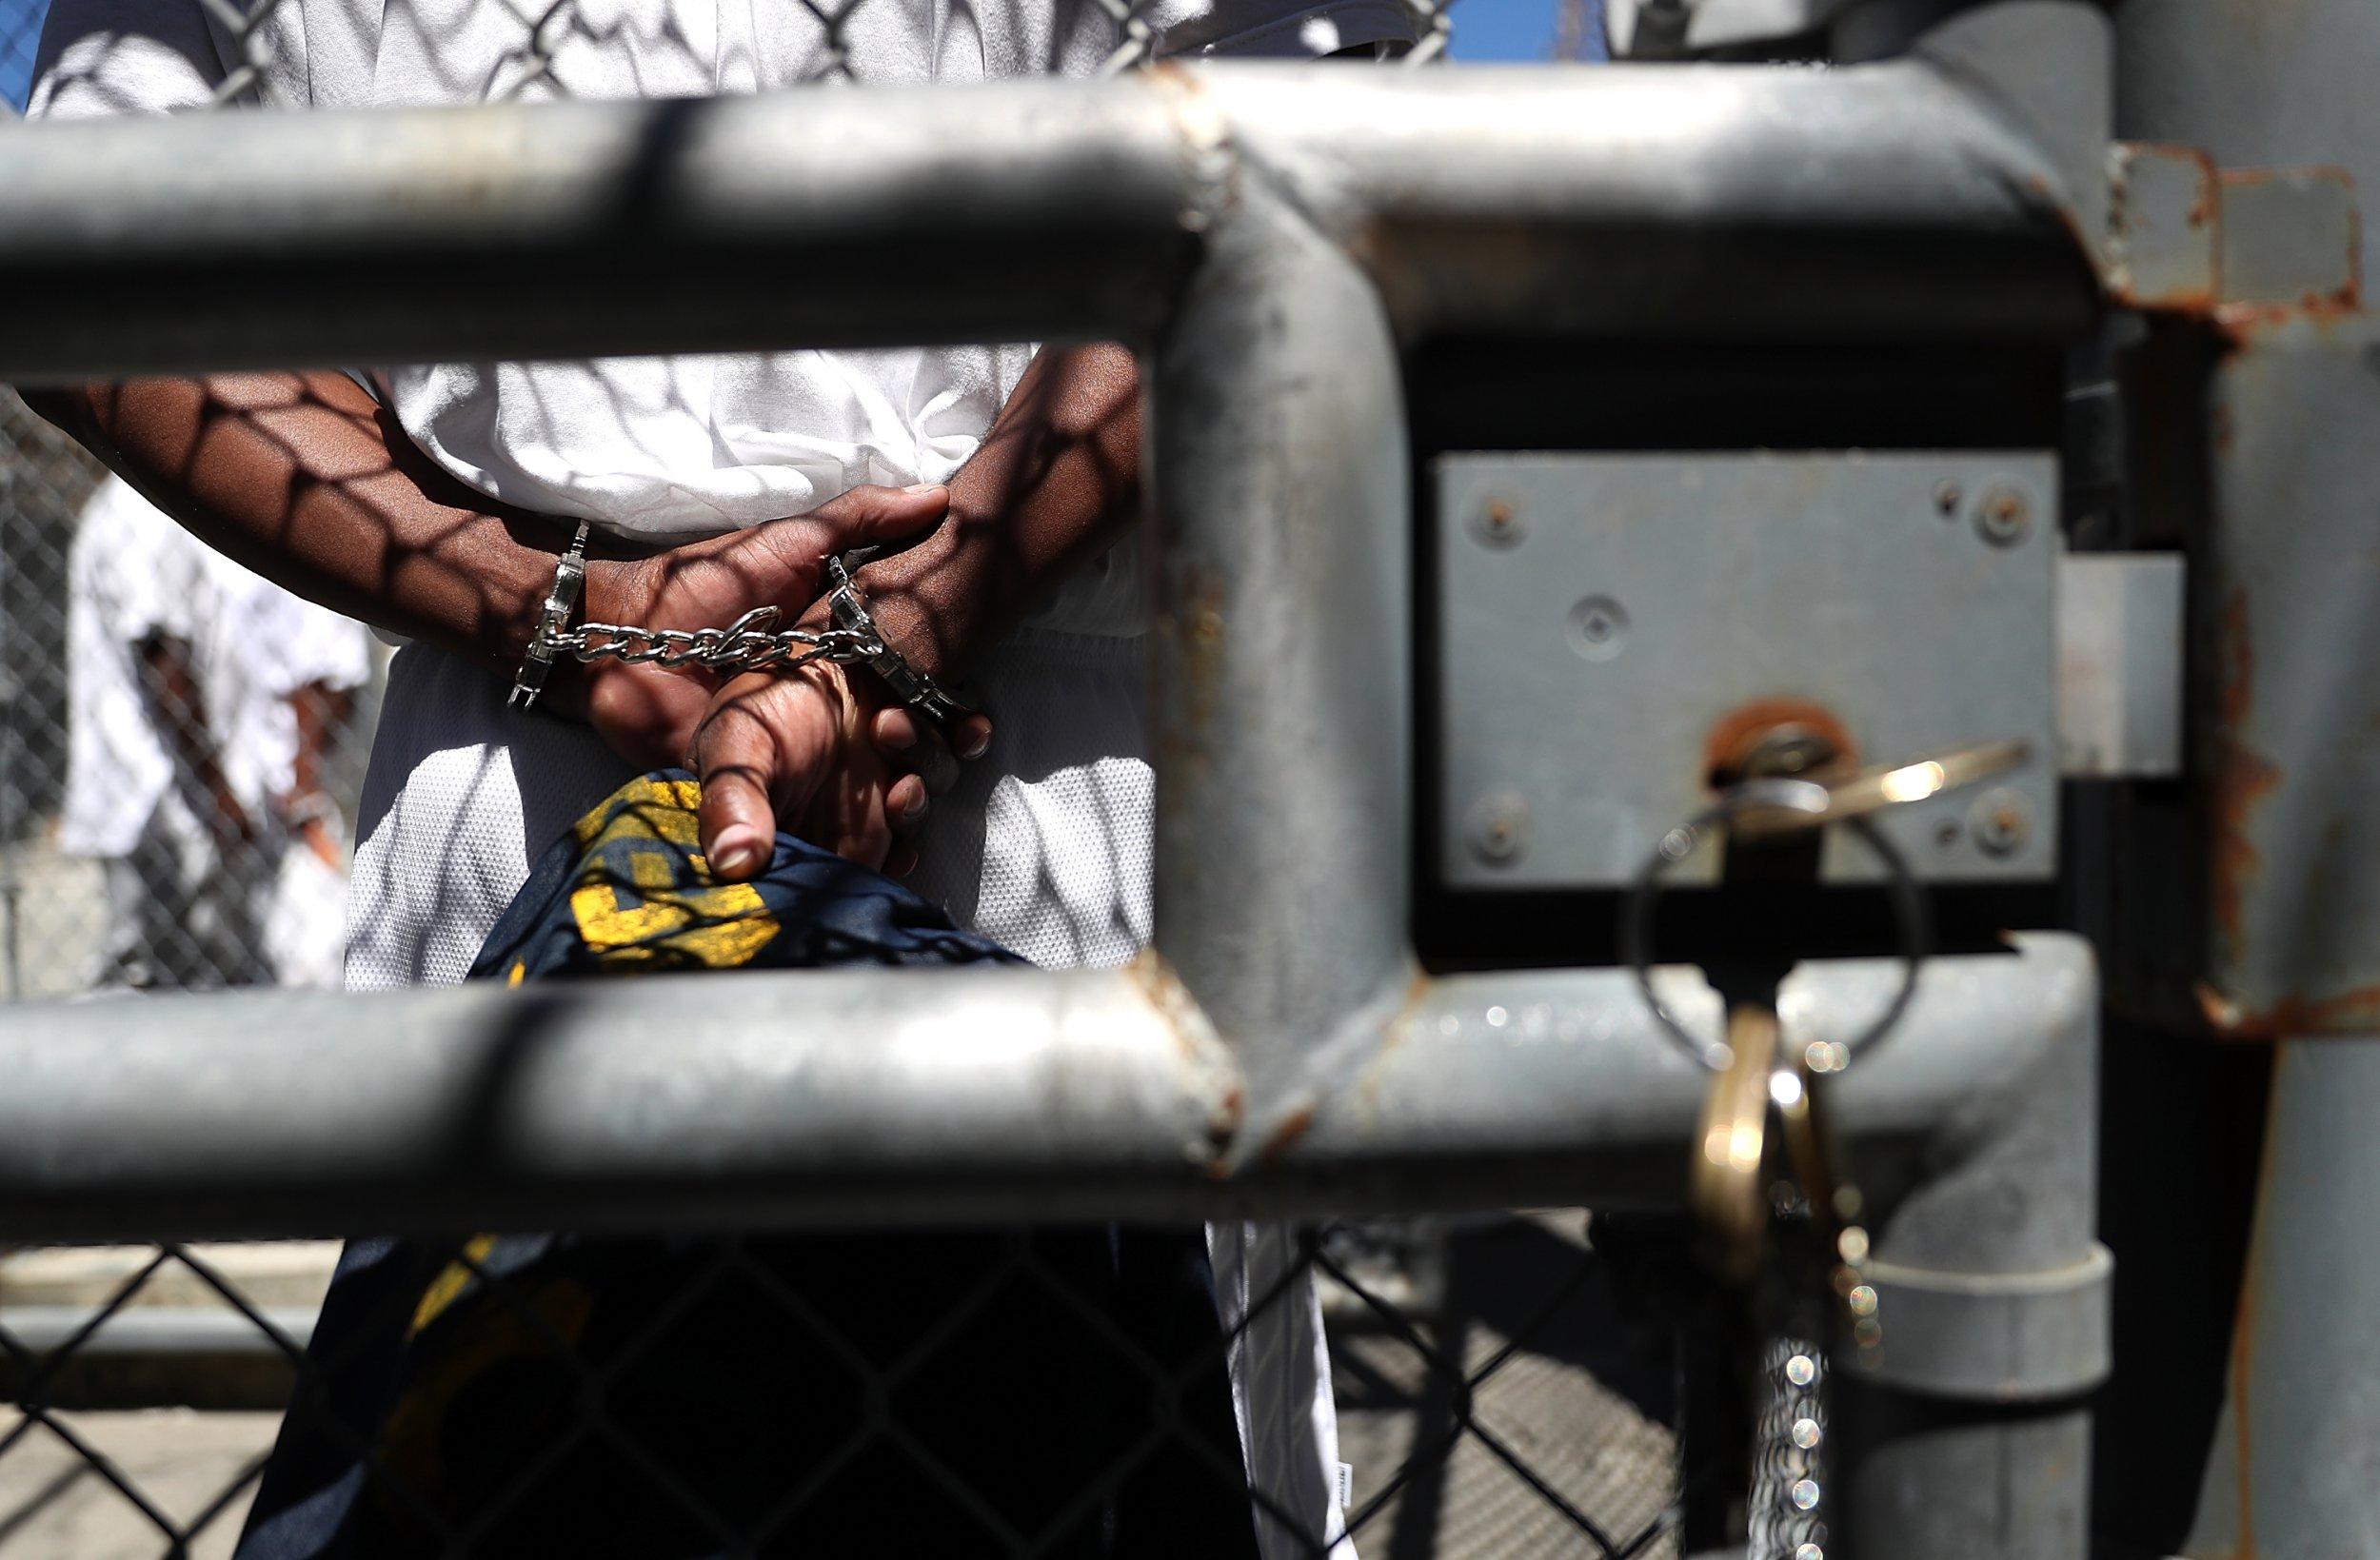 12_20_Handcuffs Jail